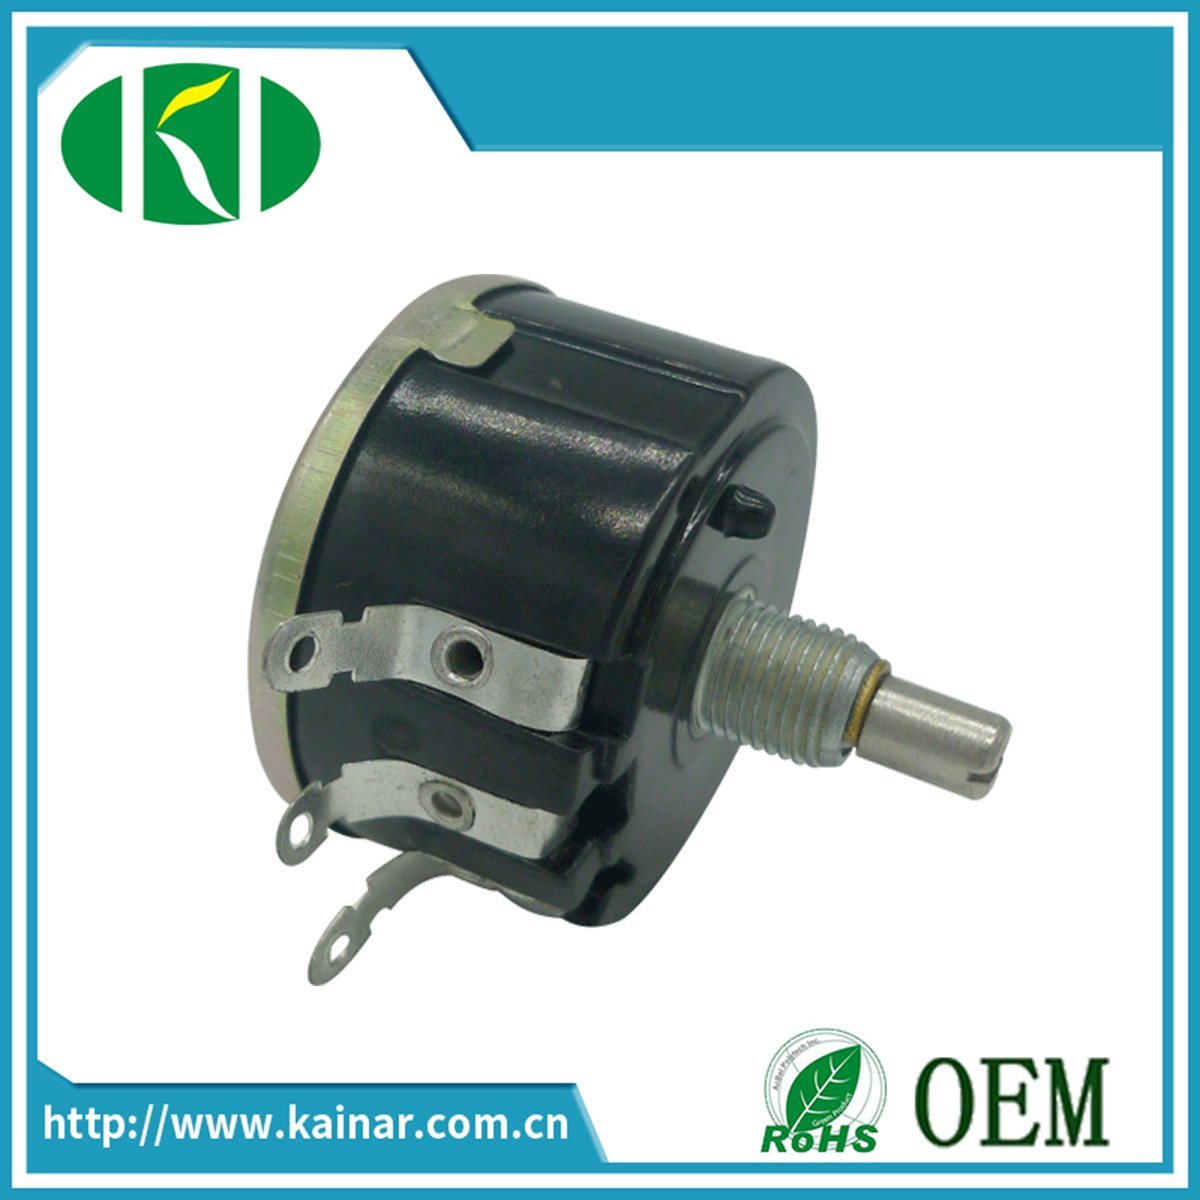 Wx050 Single Turn Precision Wirewound Potentiometer